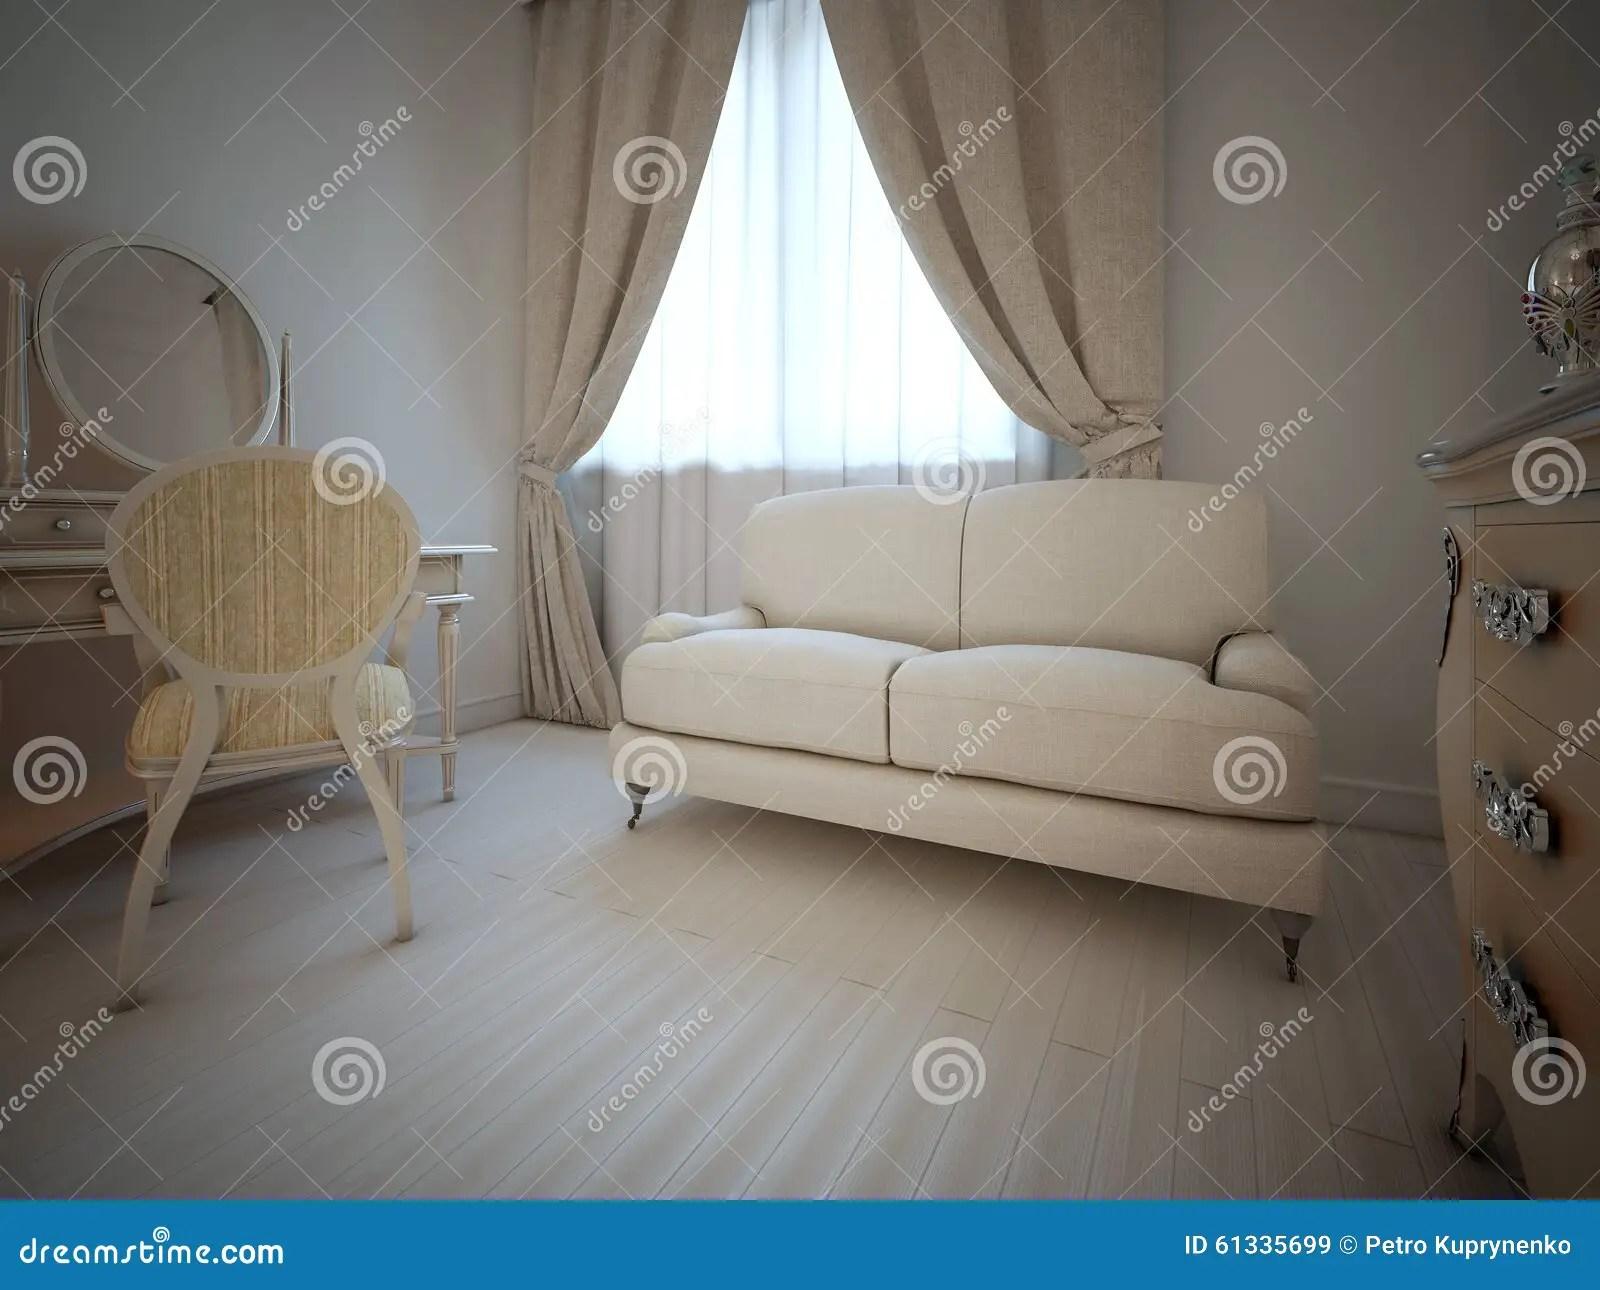 vintage bedroom interior stock illustration illustration of lamp 61335699